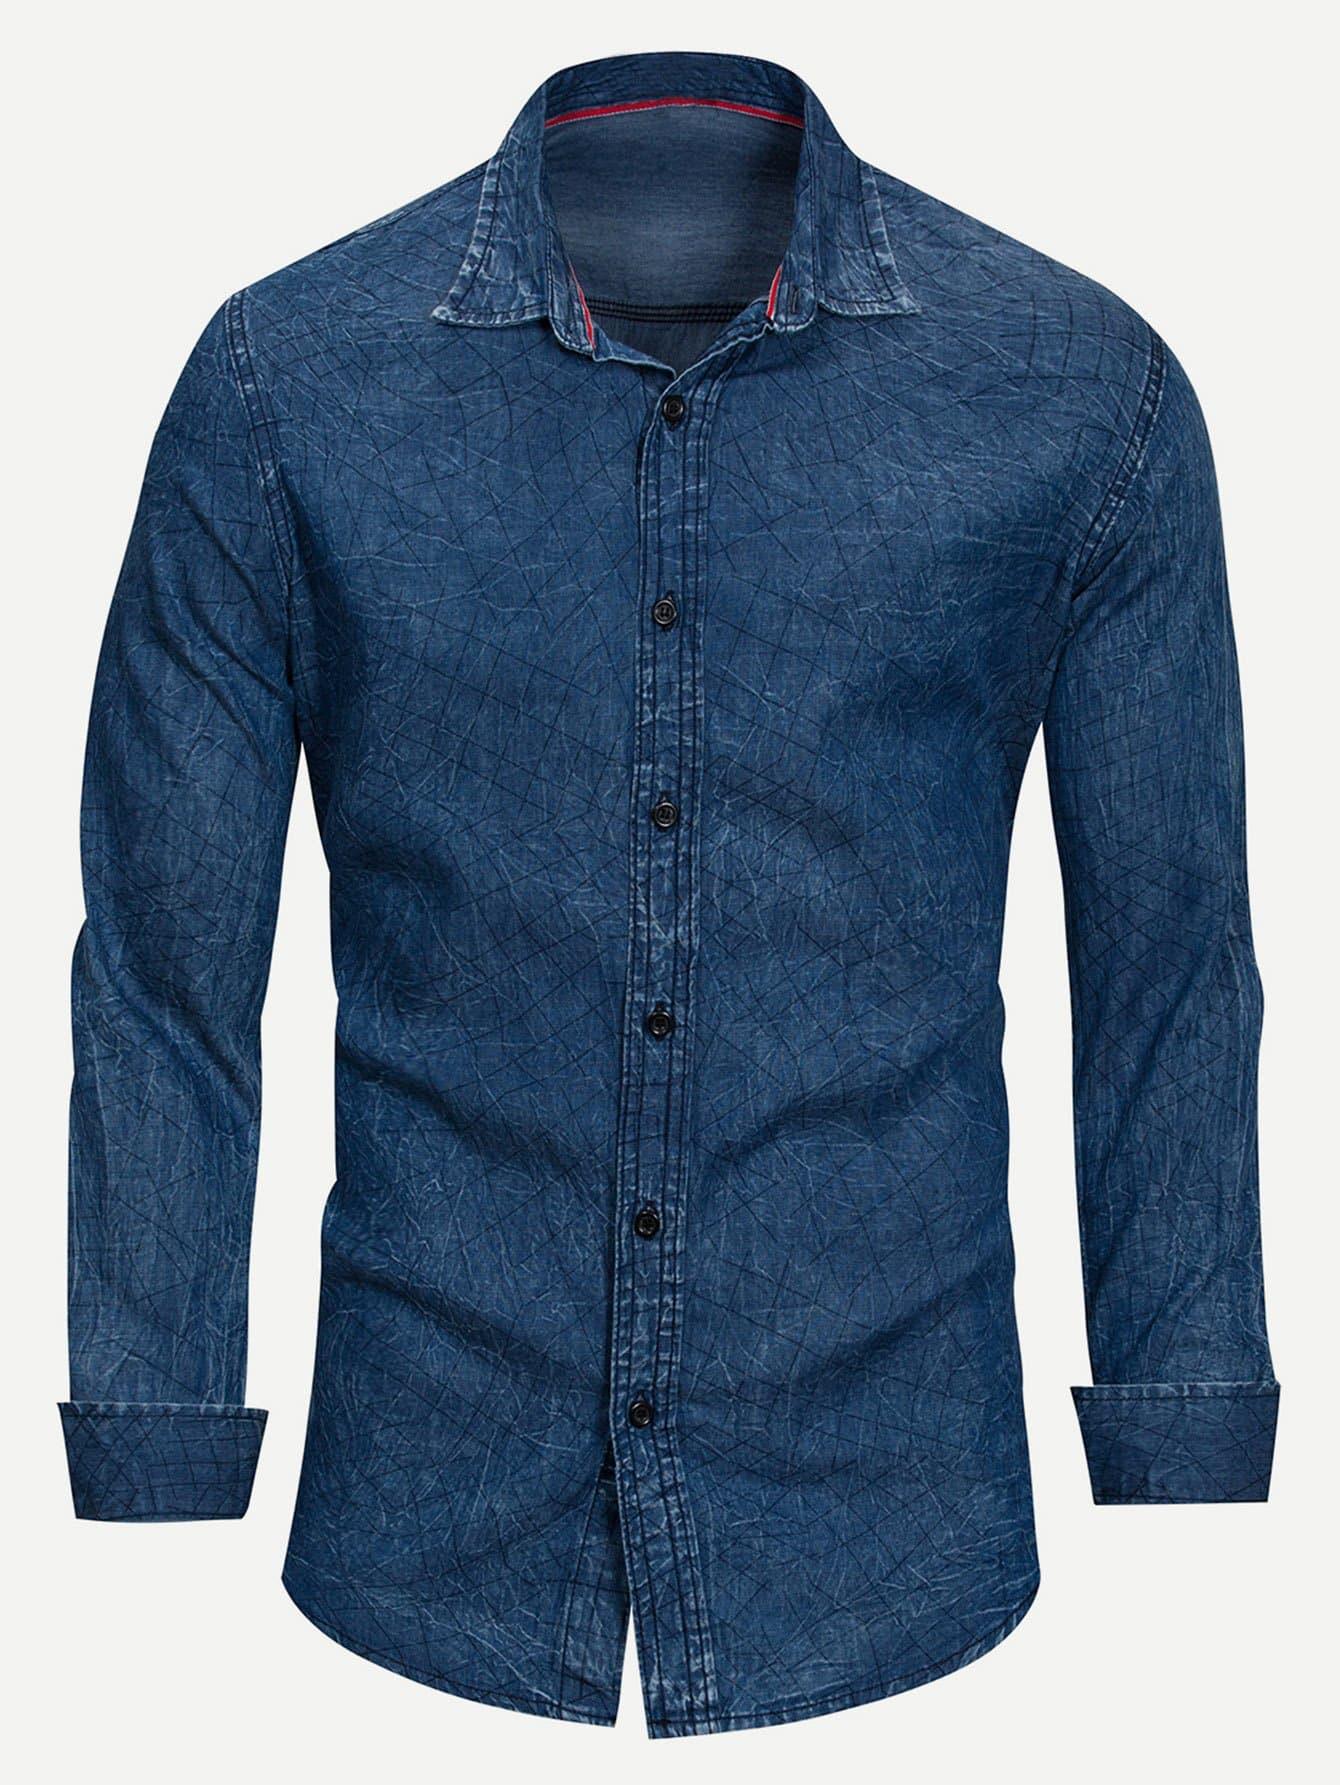 Men Solid Collar Denim Shirt Men Solid Collar Denim Shirt